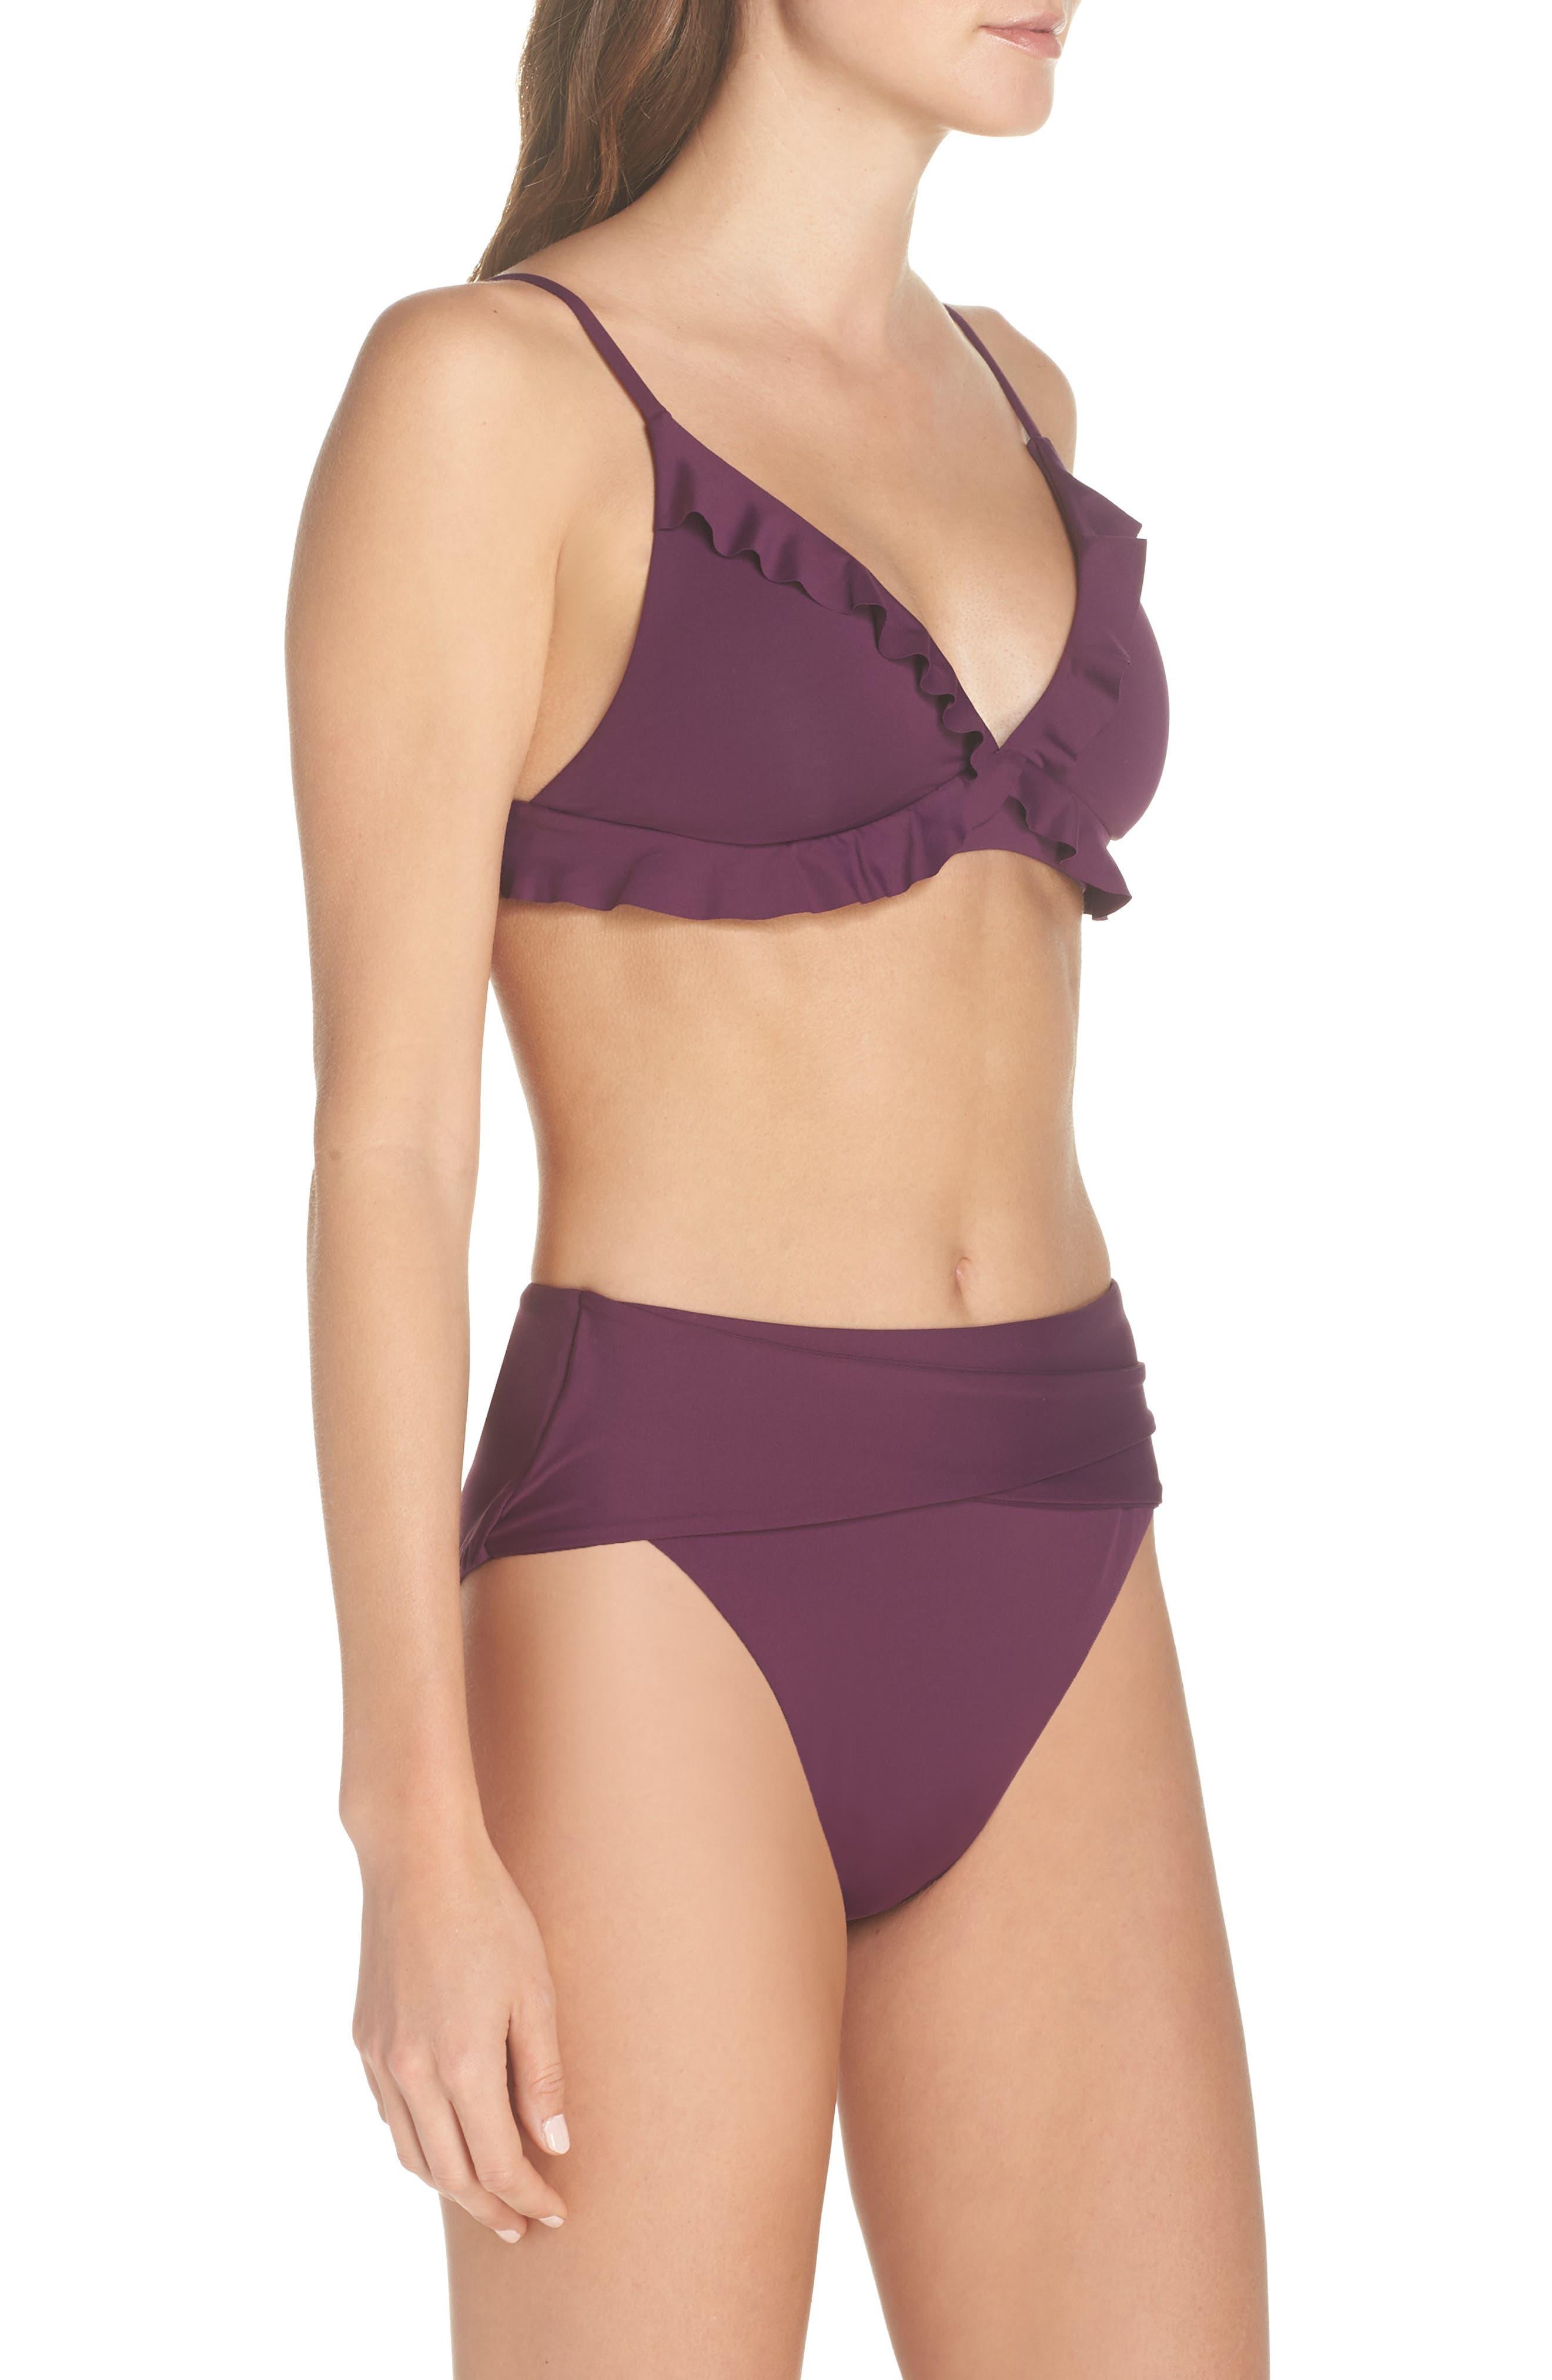 BECCA, Color Code Crossover High Waist Bikini Bottoms, Alternate thumbnail 10, color, MERLOT